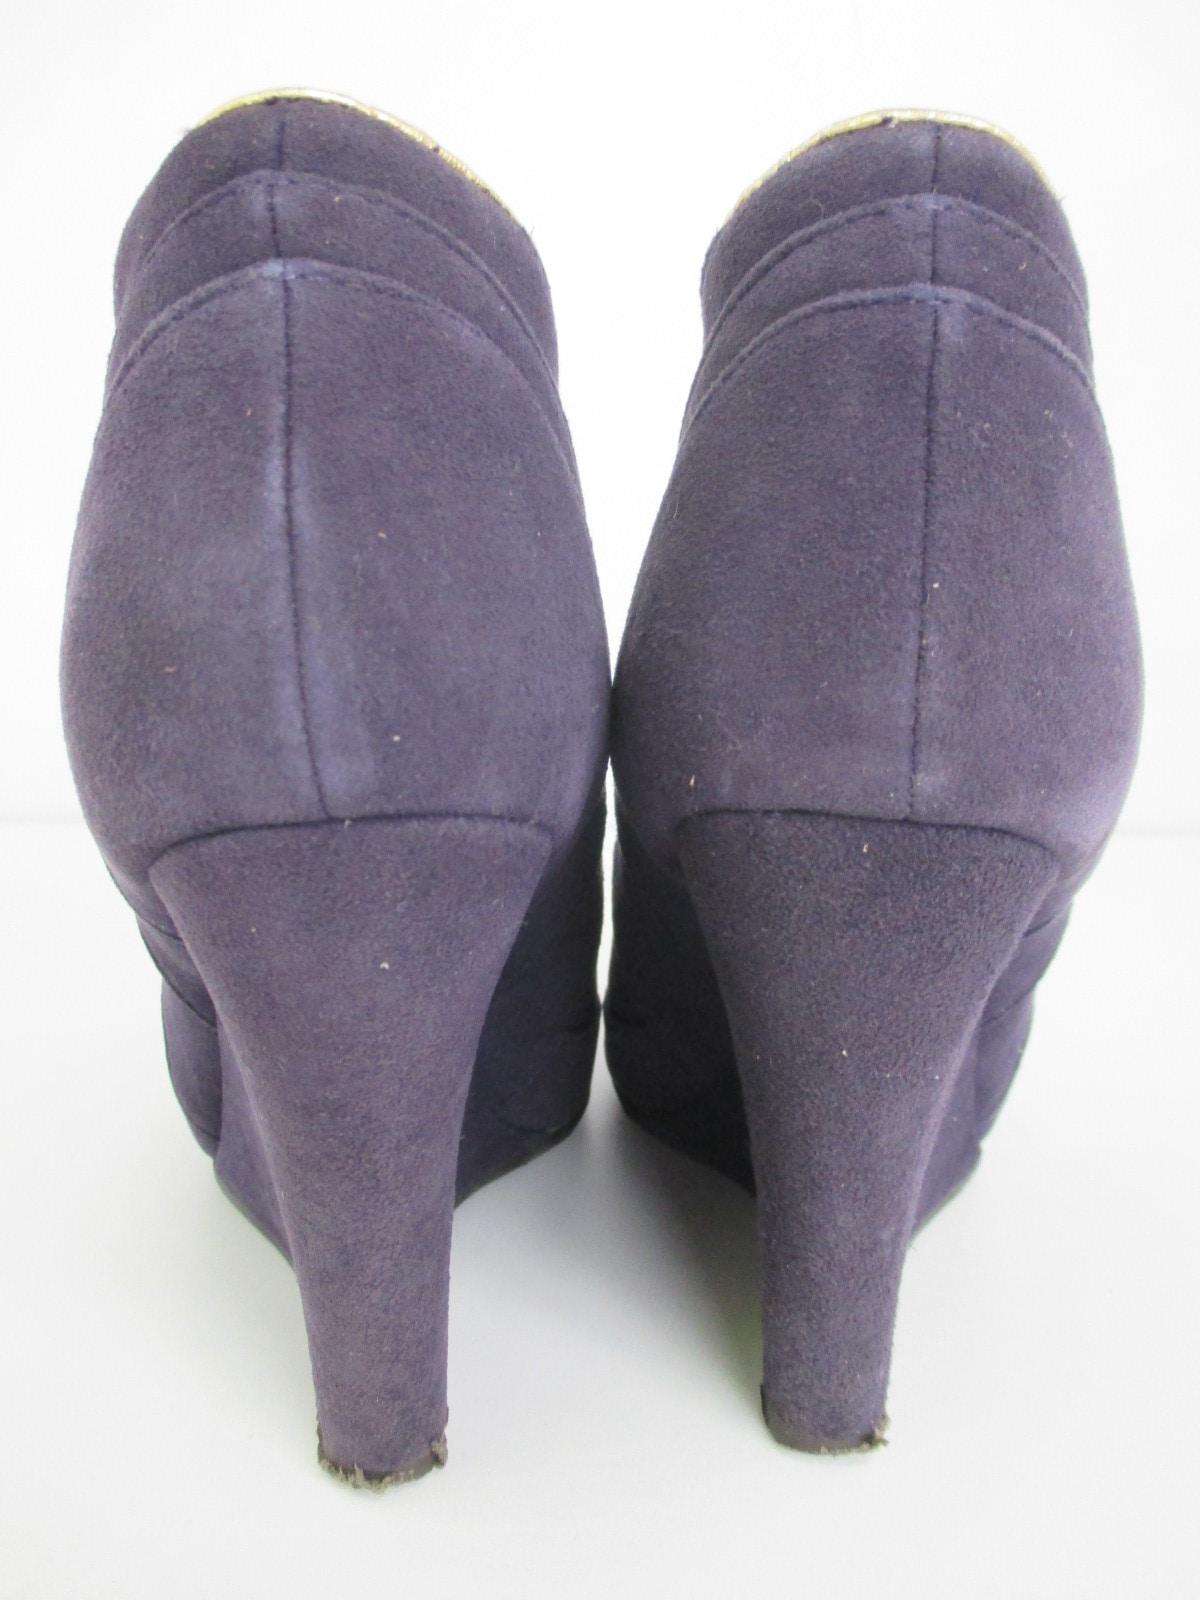 rosebullet(ローズブリット)のブーツ